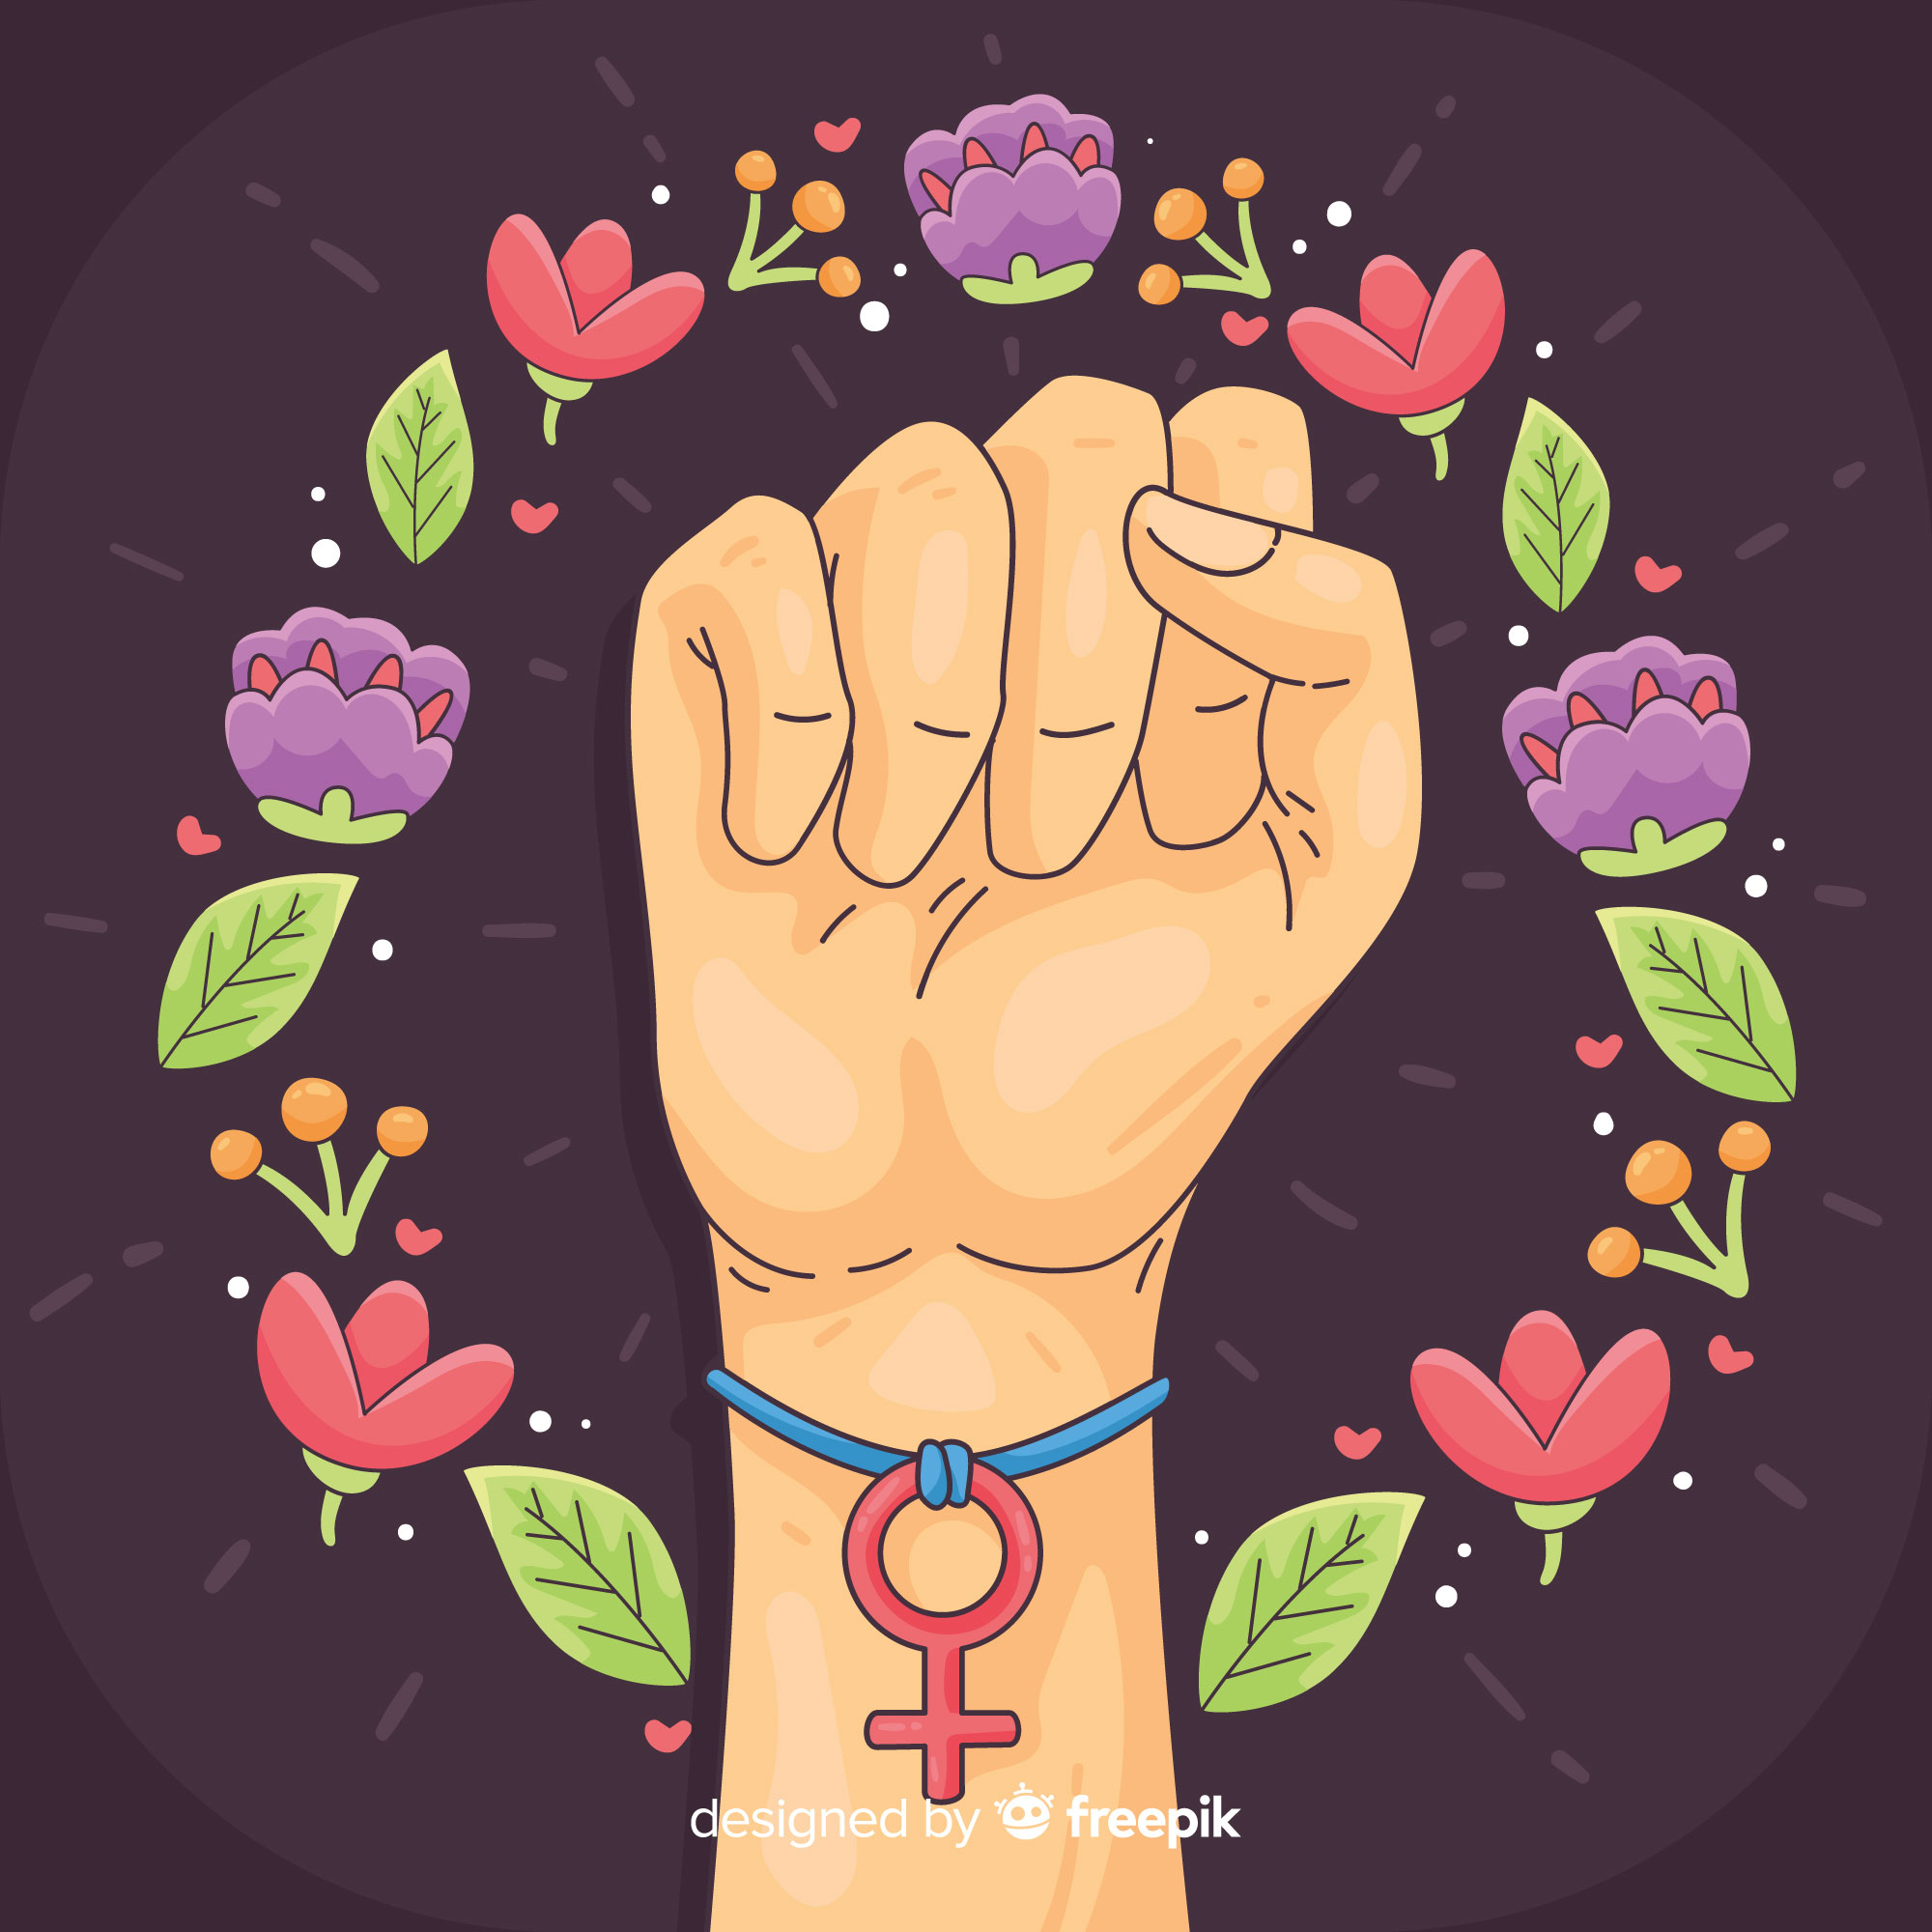 ¡Que viva la lucha ecofeminista!